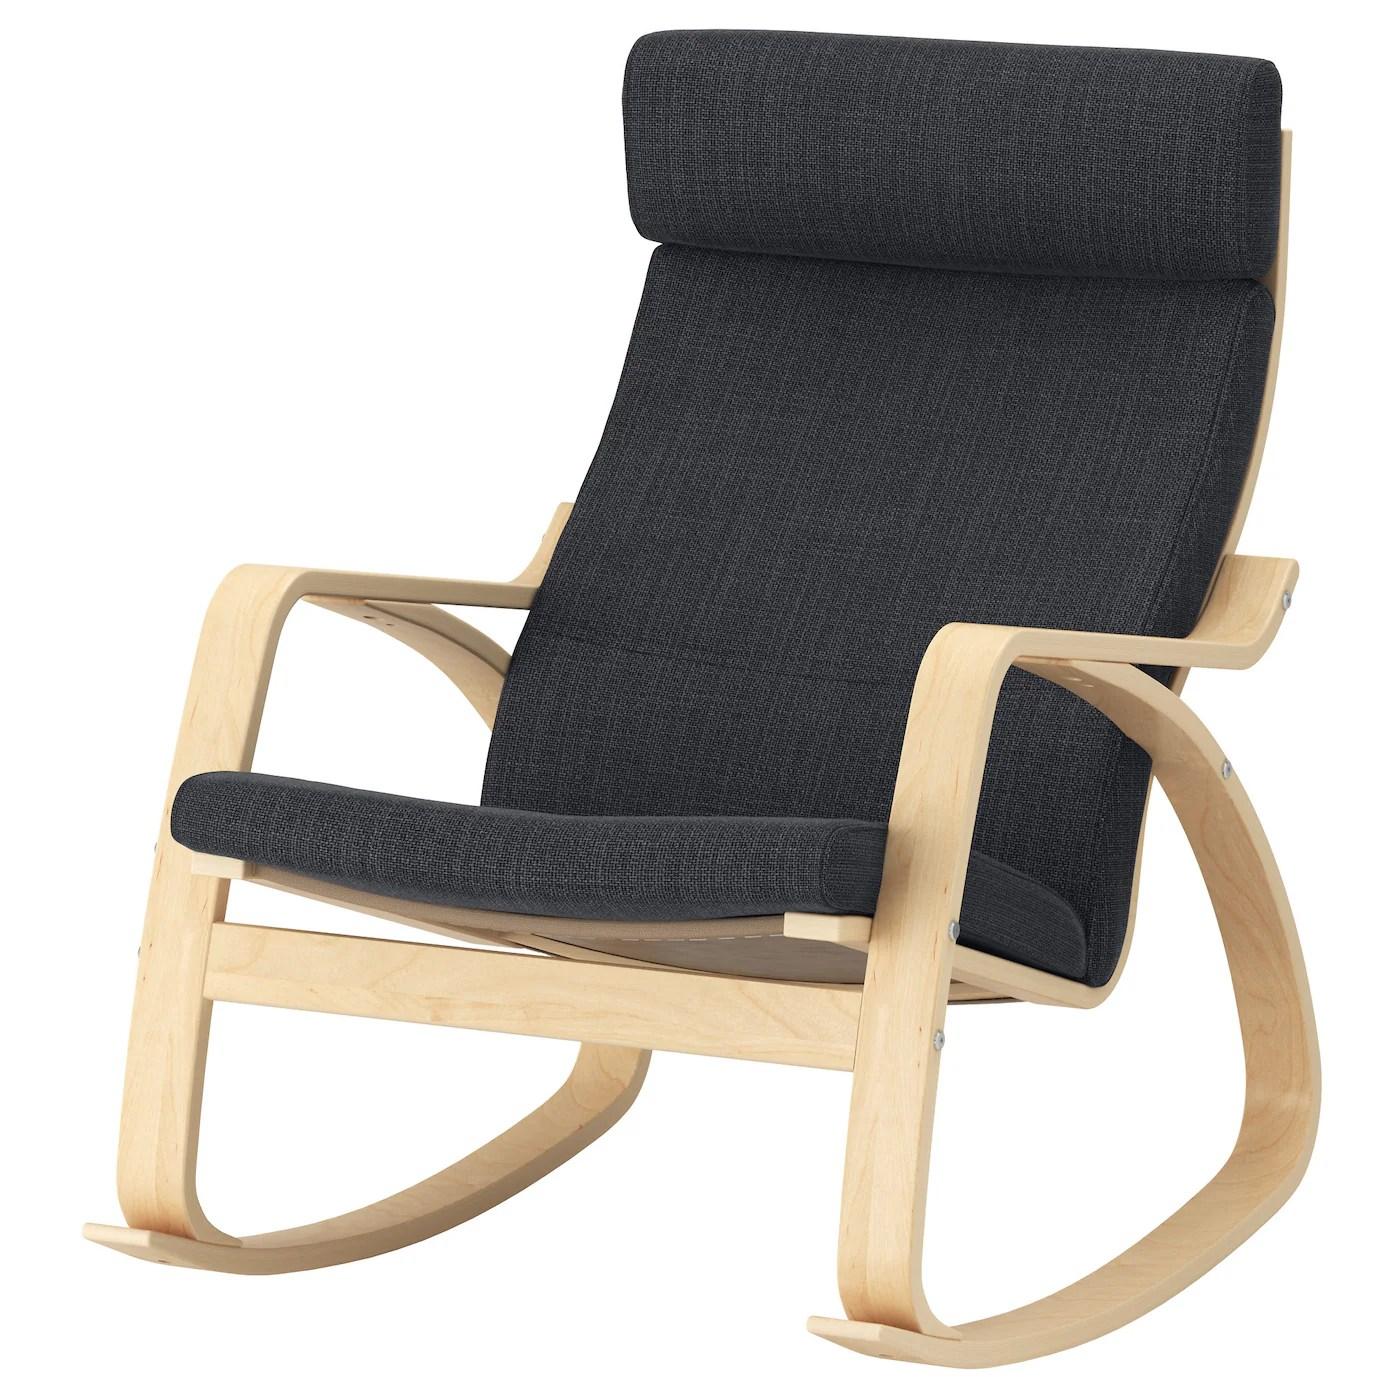 wingback chair covers ireland antique desk fabric armchairs ikea dublin